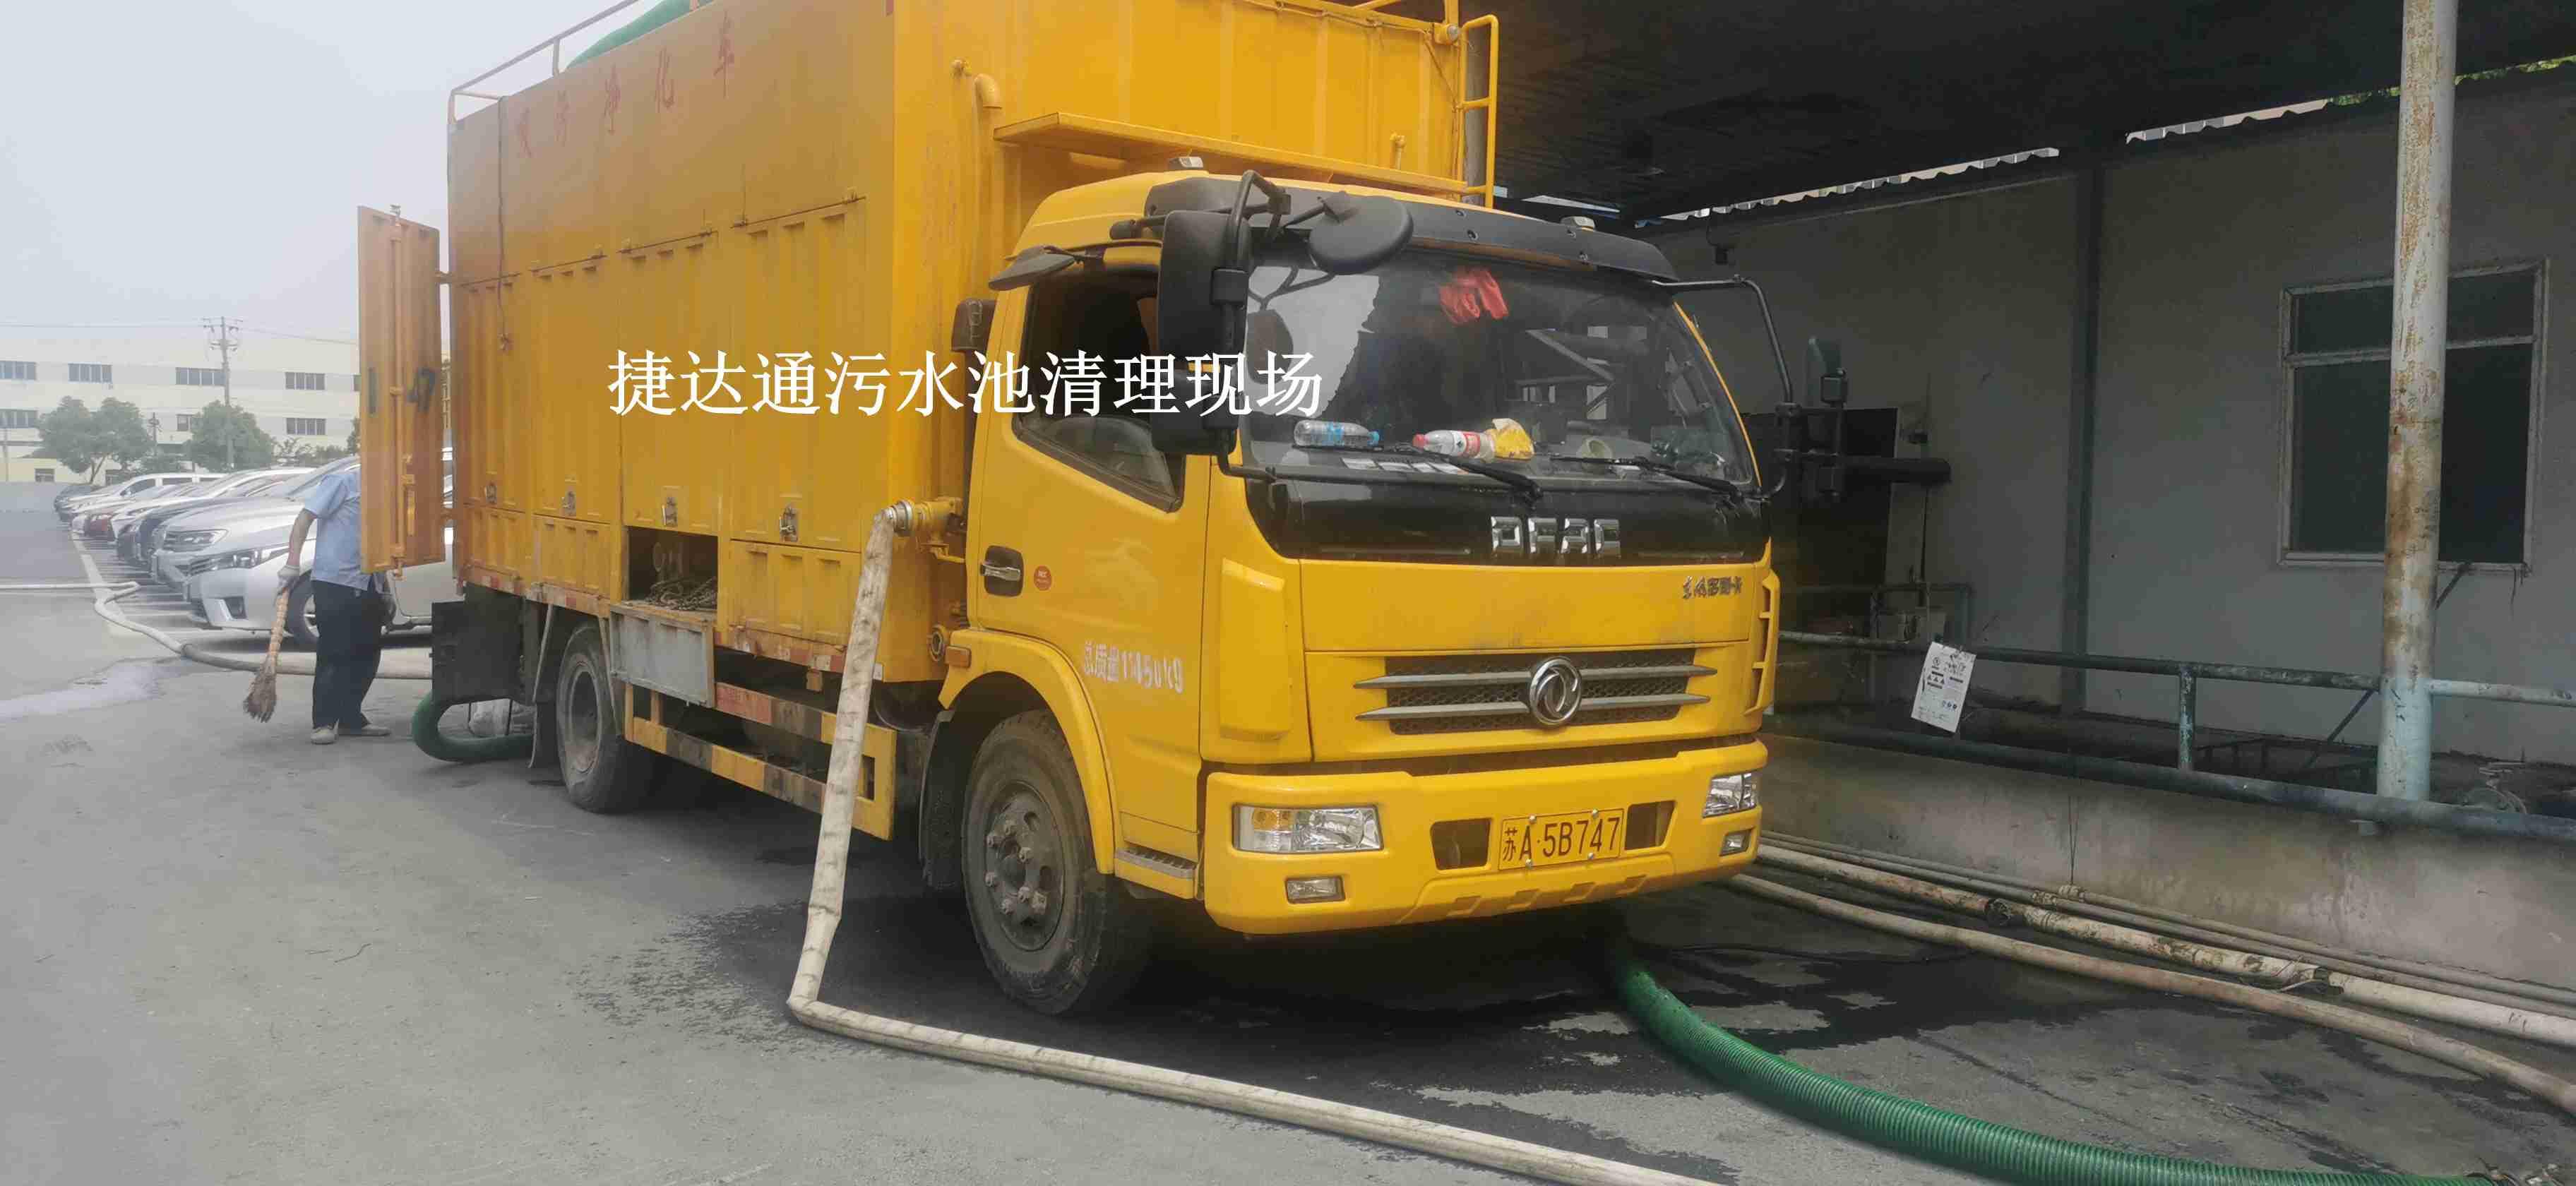 Mob✆-温州市龙湾区污泥净化处理安全施工公司【捷达通】